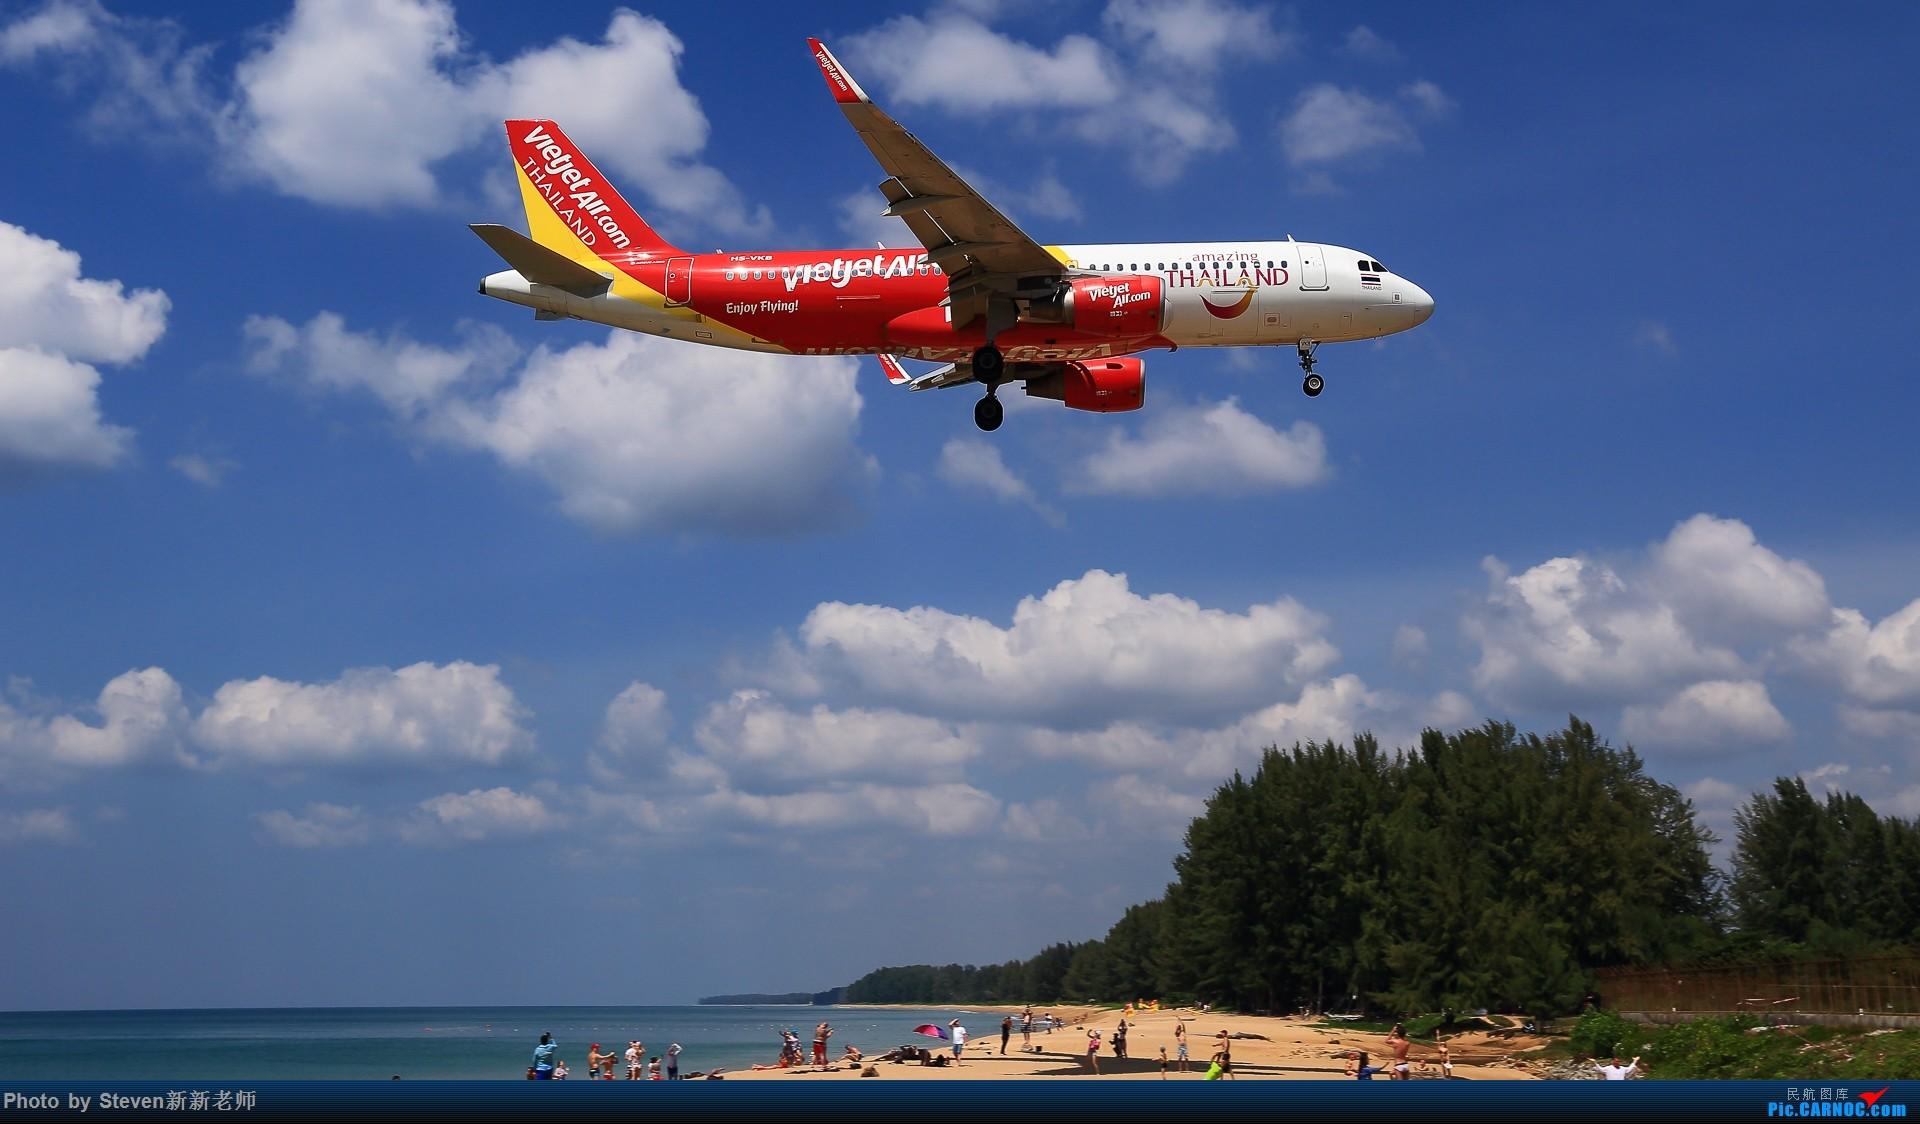 "Re:[原创]亚洲""圣马丁岛""—普吉国际机场拍机 AIRBUS A320-200 HS-VKB 泰国普吉机场"